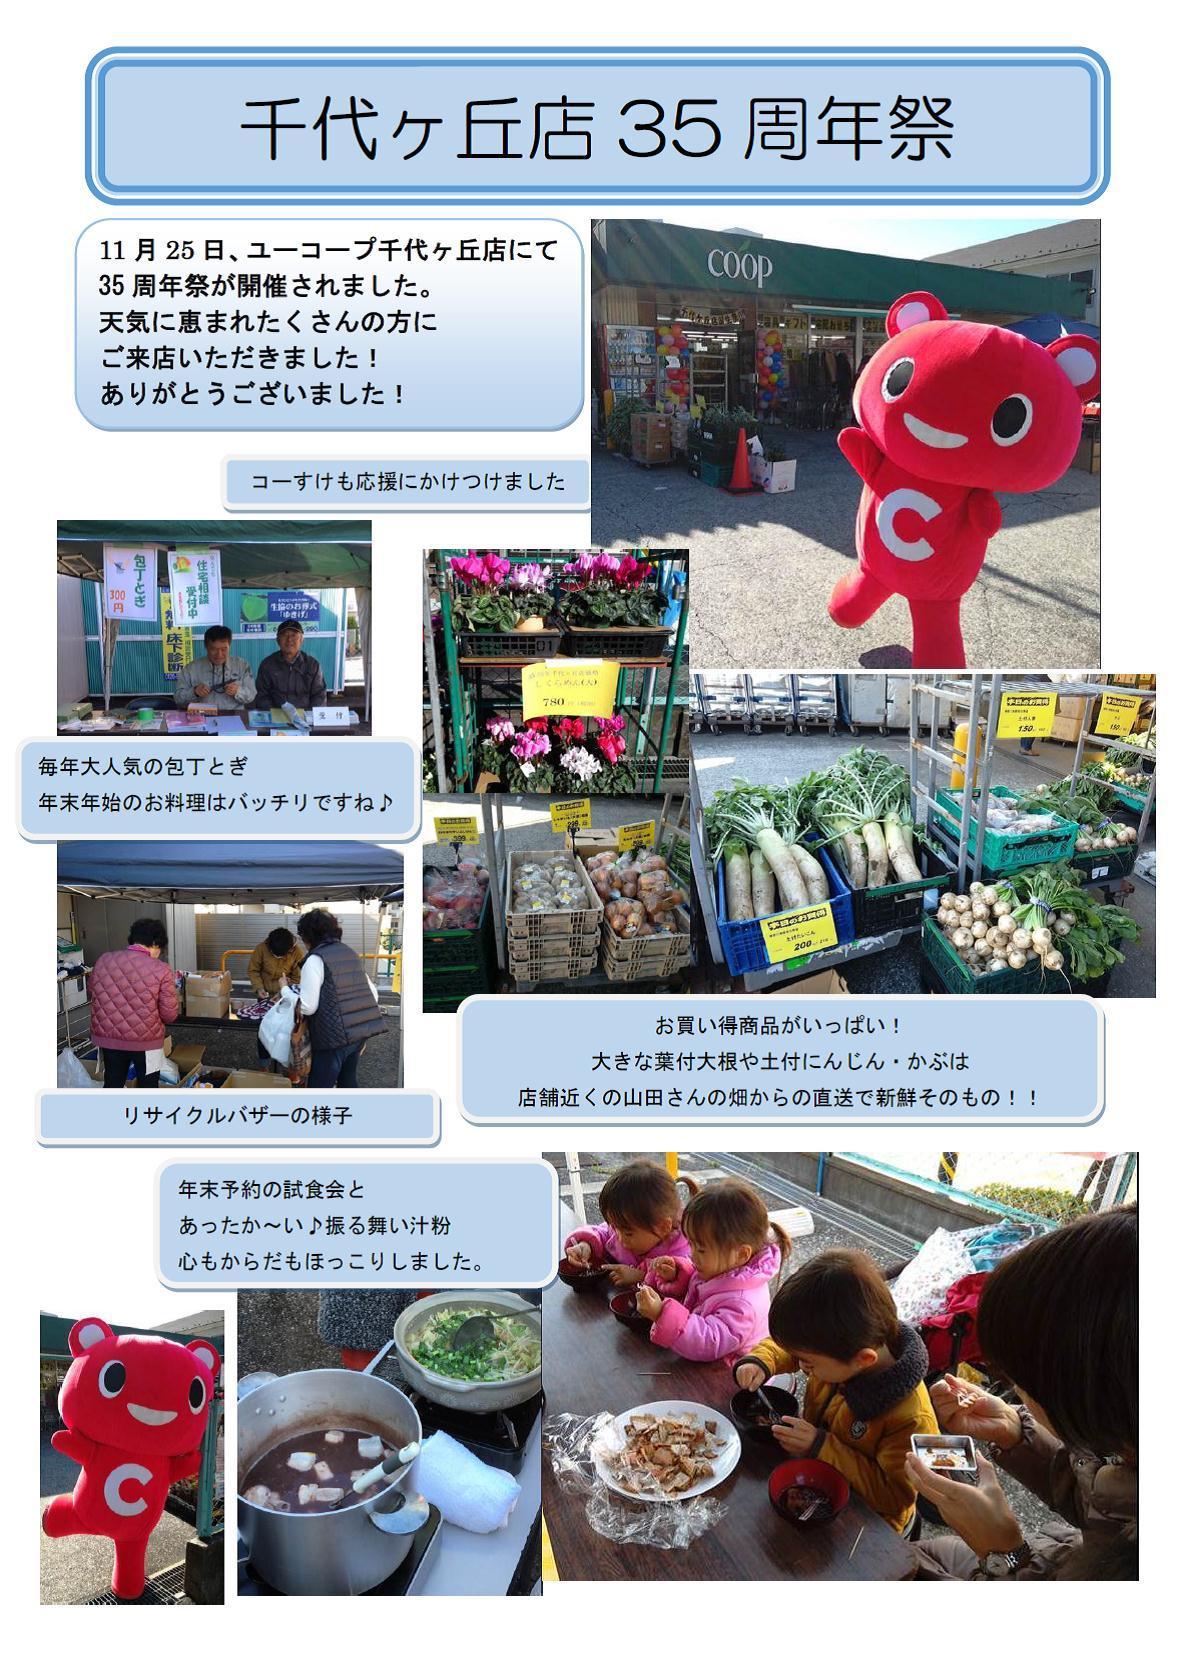 http://kanagawa.ucoop.or.jp/hiroba/areanews/files/0c16edb72274aefe1c0dd6c3fb46a6e8.jpg